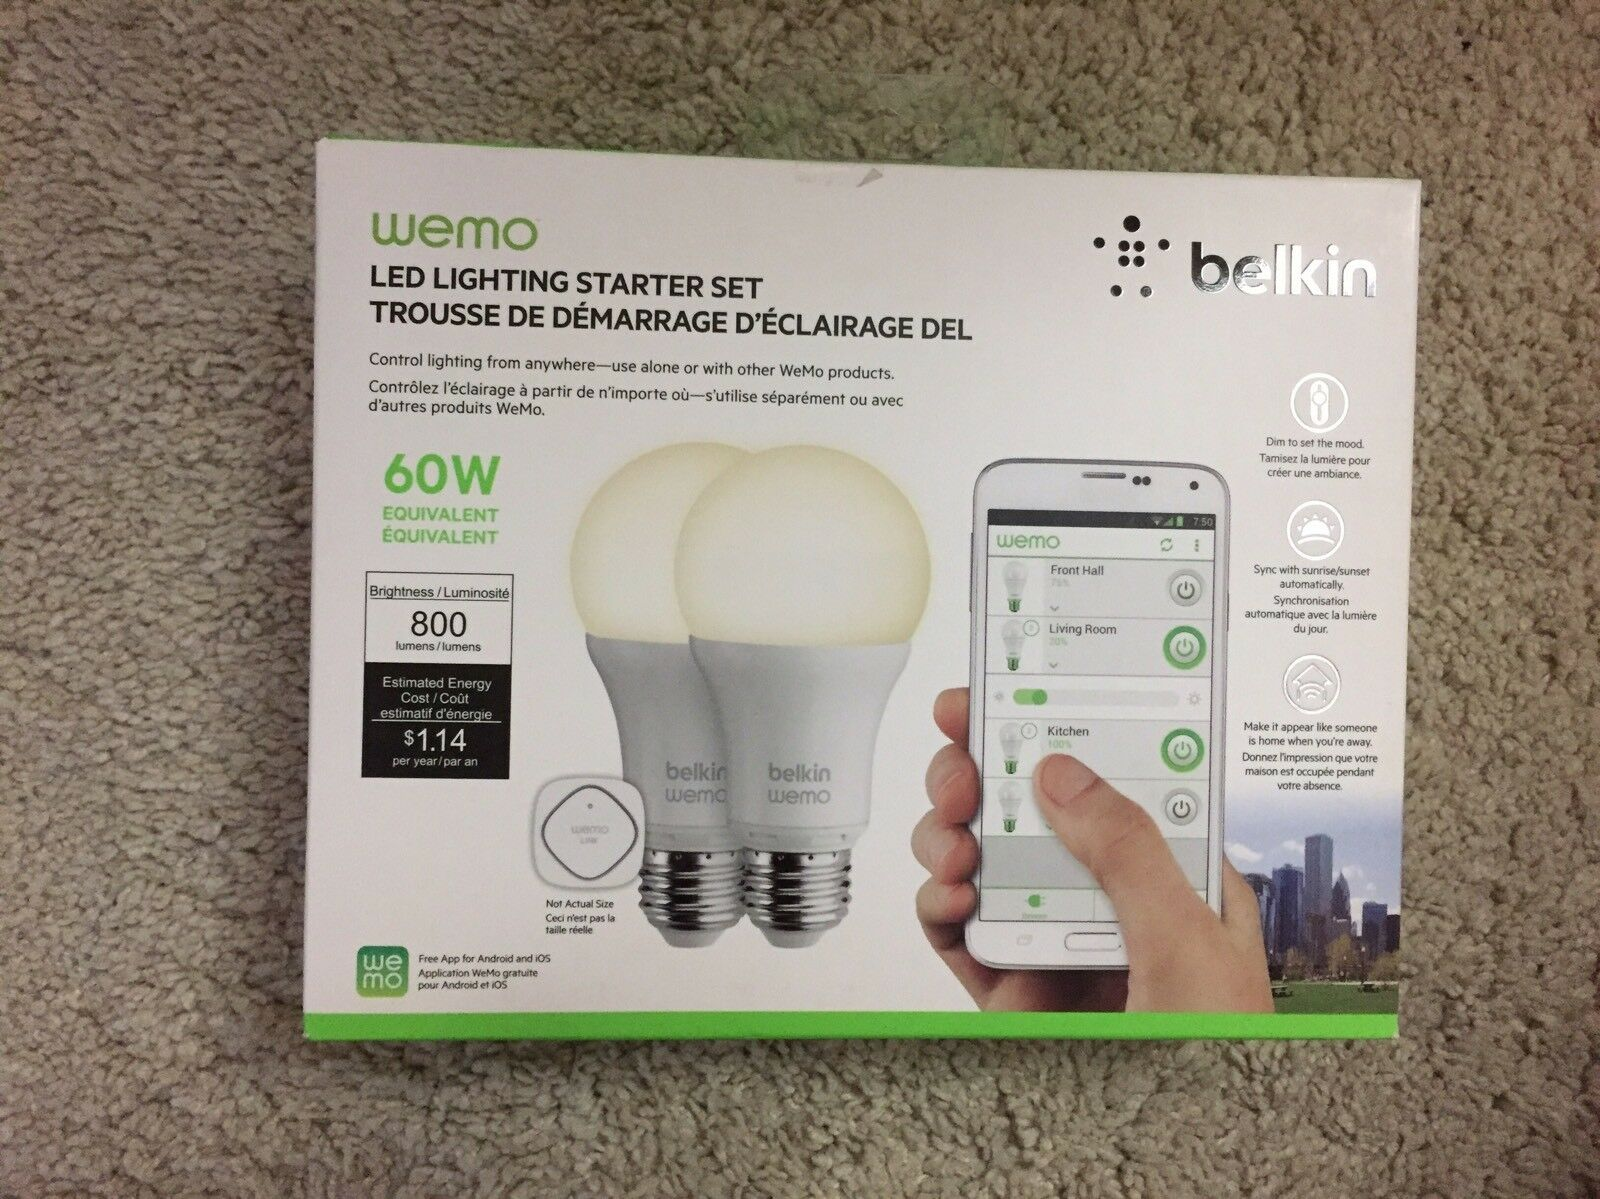 2 Sets Belkin WeMo Home Automation LED Lighting Starter Set White | eBay